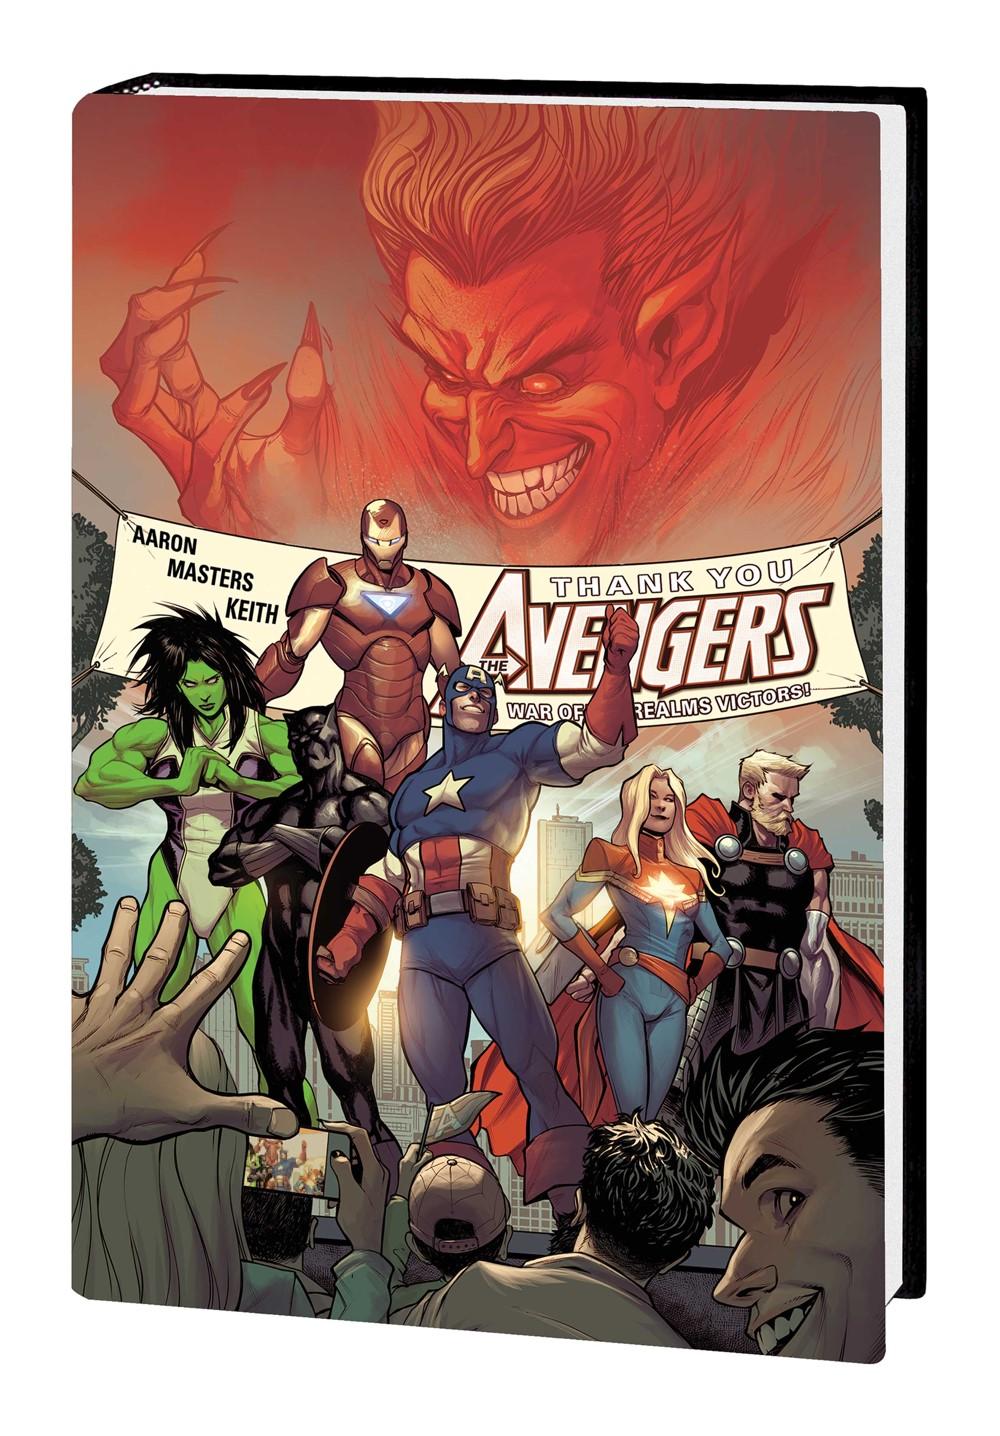 AVENGERS_JA_VOL_2_HC Marvel Comics September 2021 Solicitations